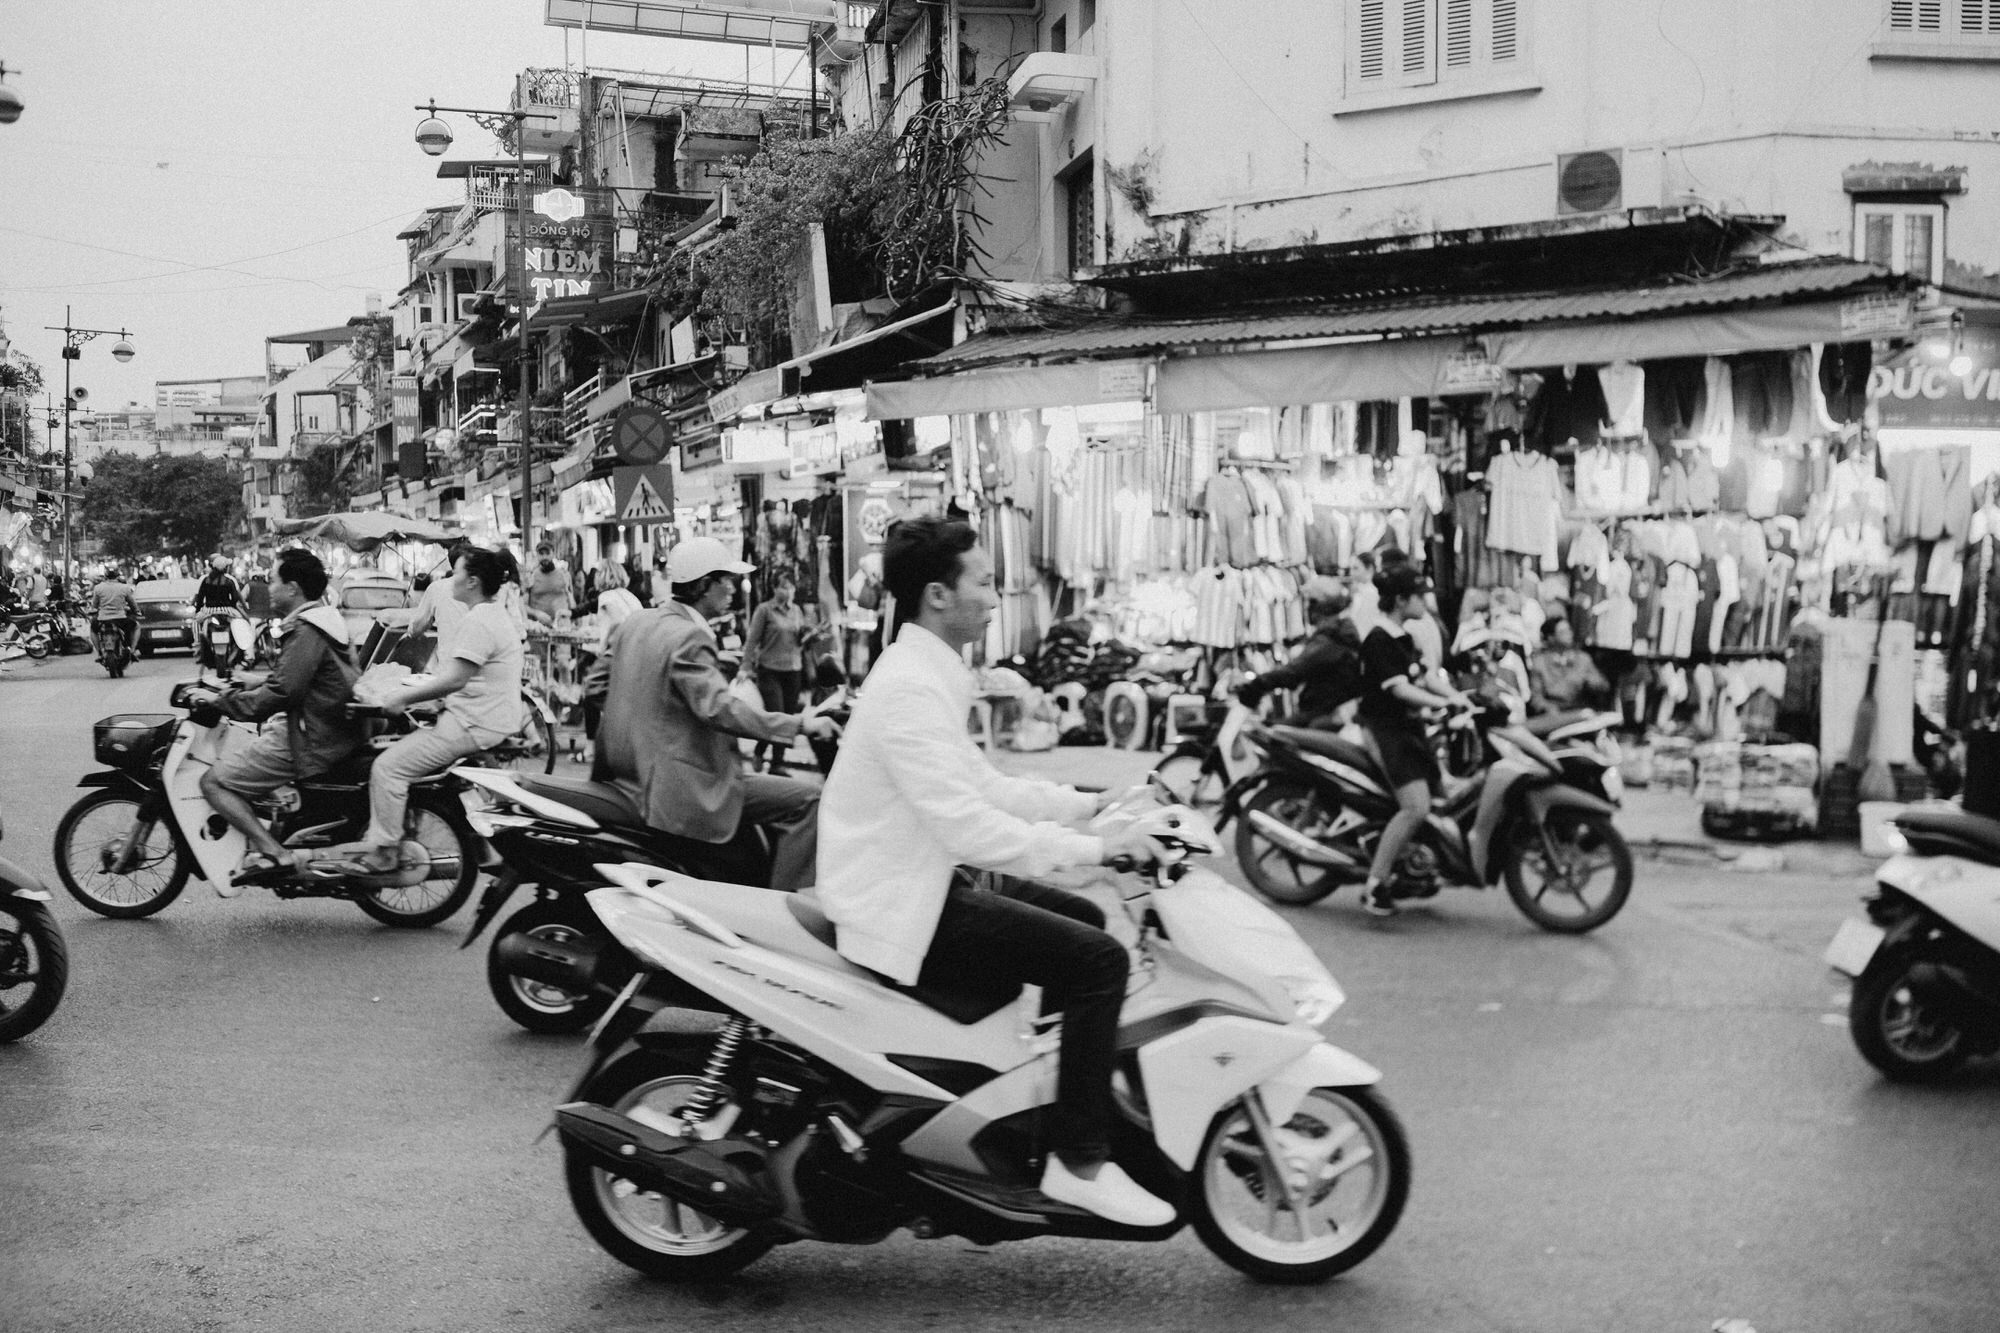 hanoivietnamtravelblog-9689-1.jpg